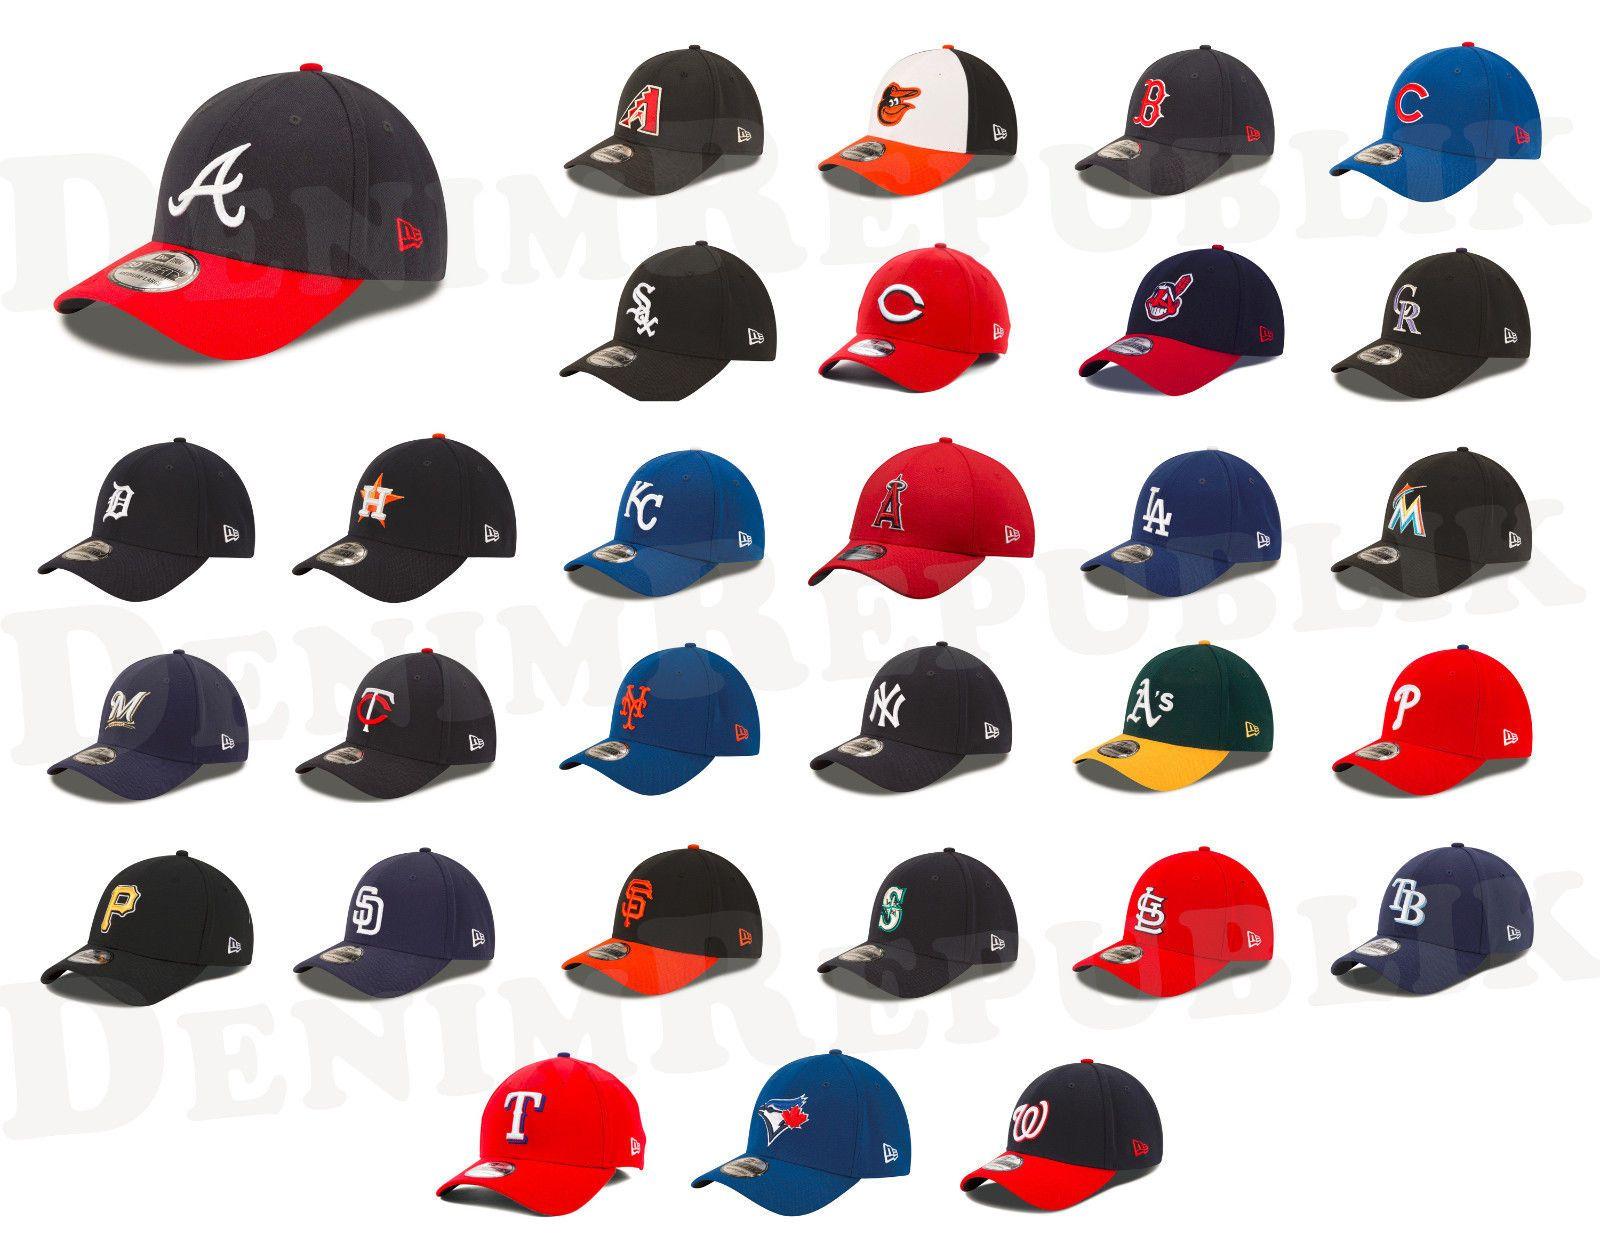 New Era 3930 Mlb Cap All Teams Baseball Stretch Fit Team Classic Adjustable Hat Fit Team All Team Adjustable Hat